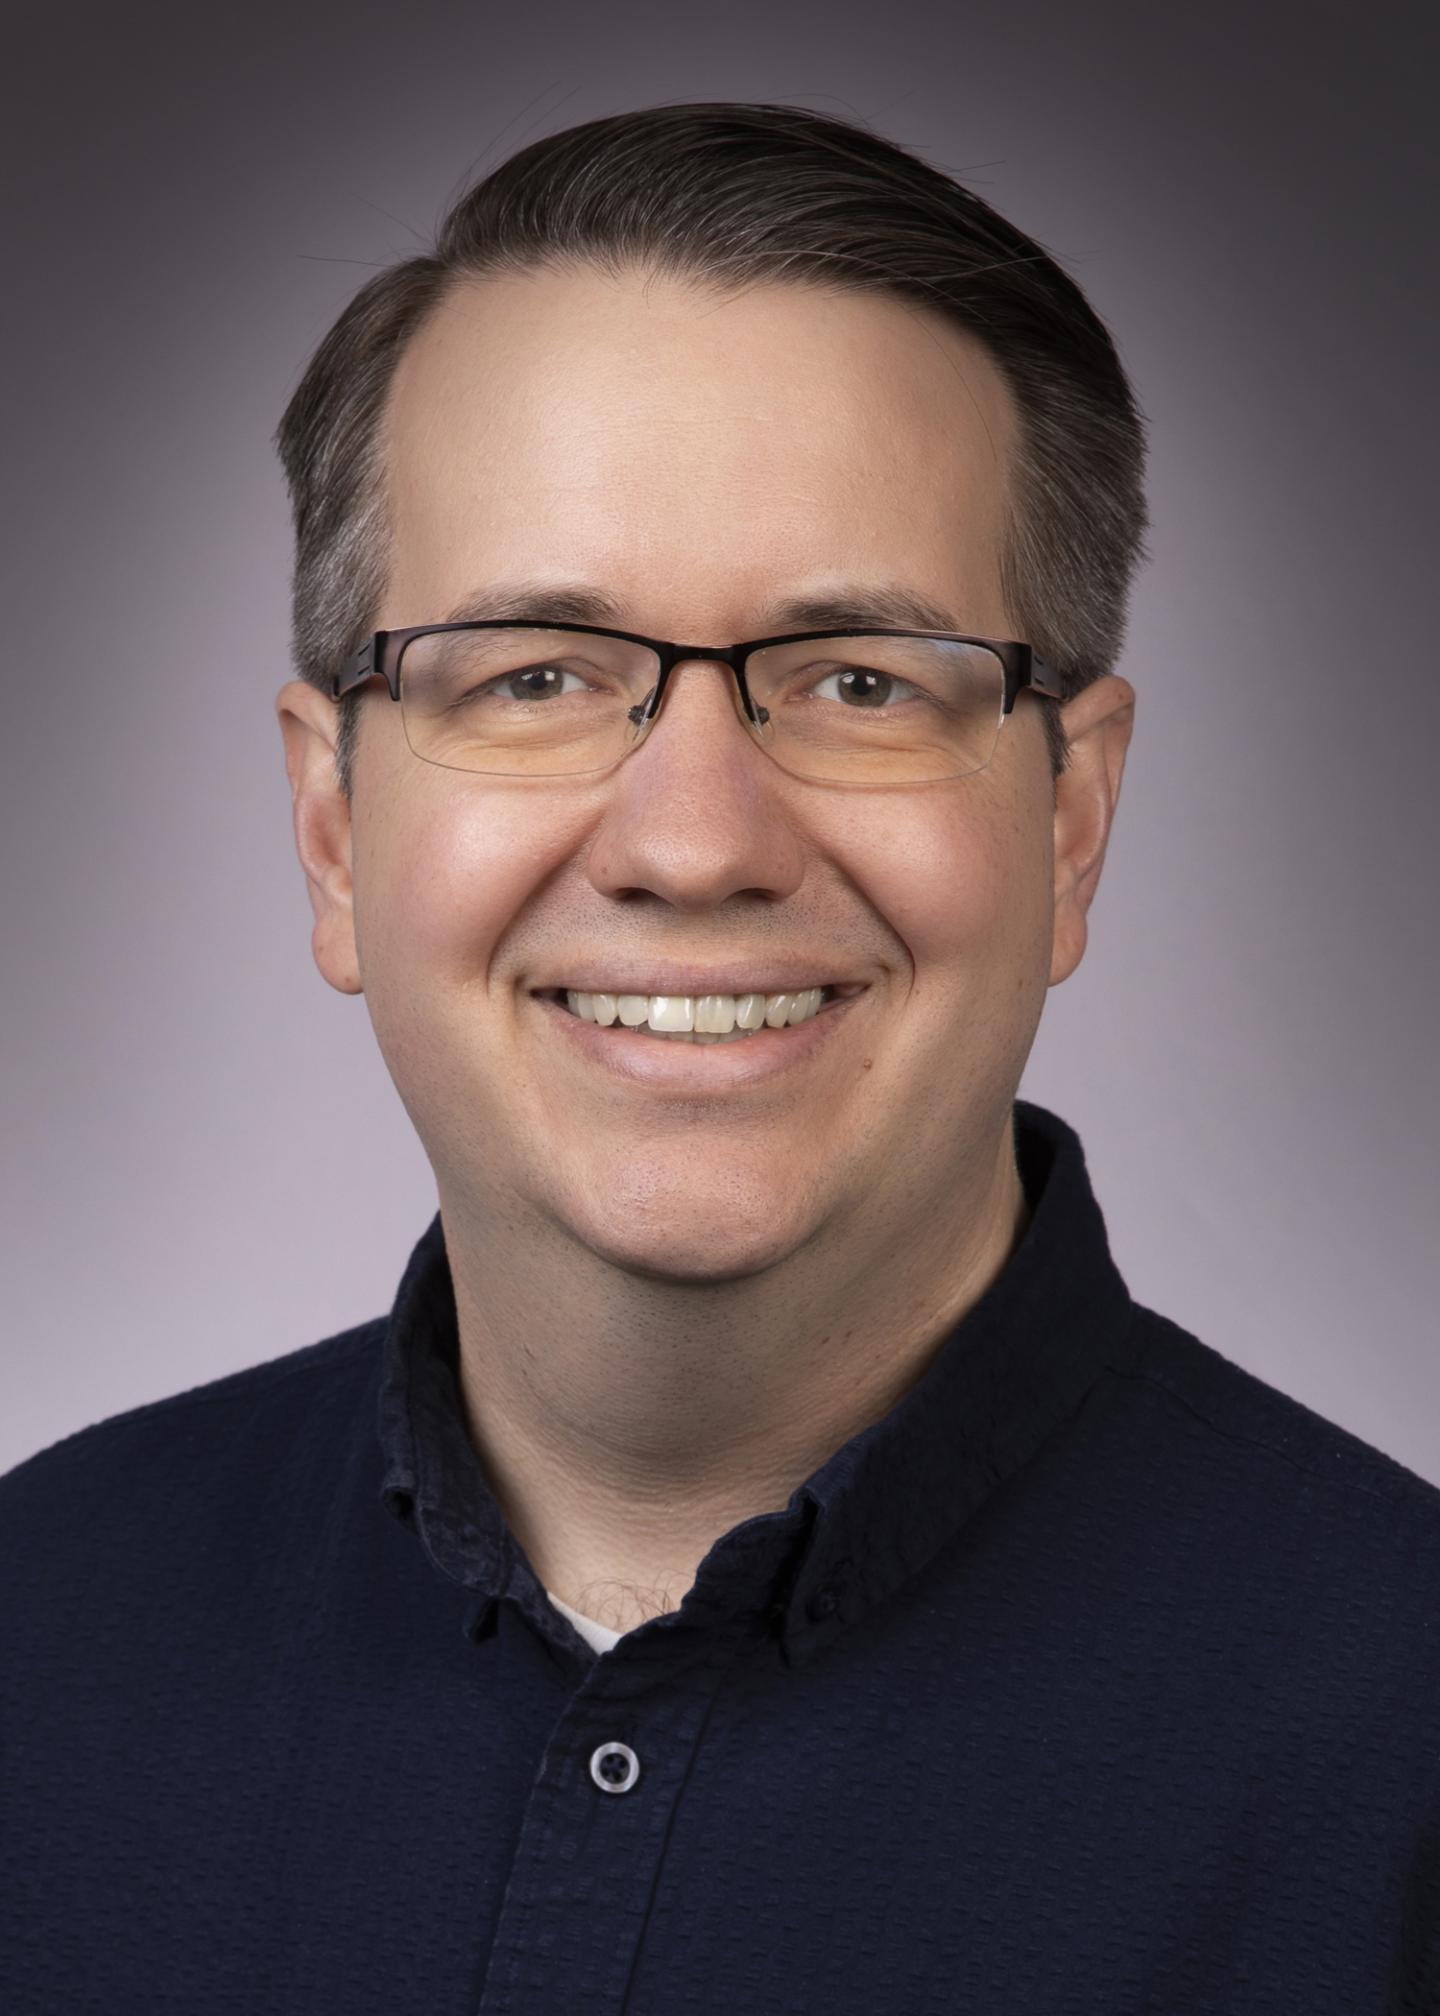 Ben R. Warner